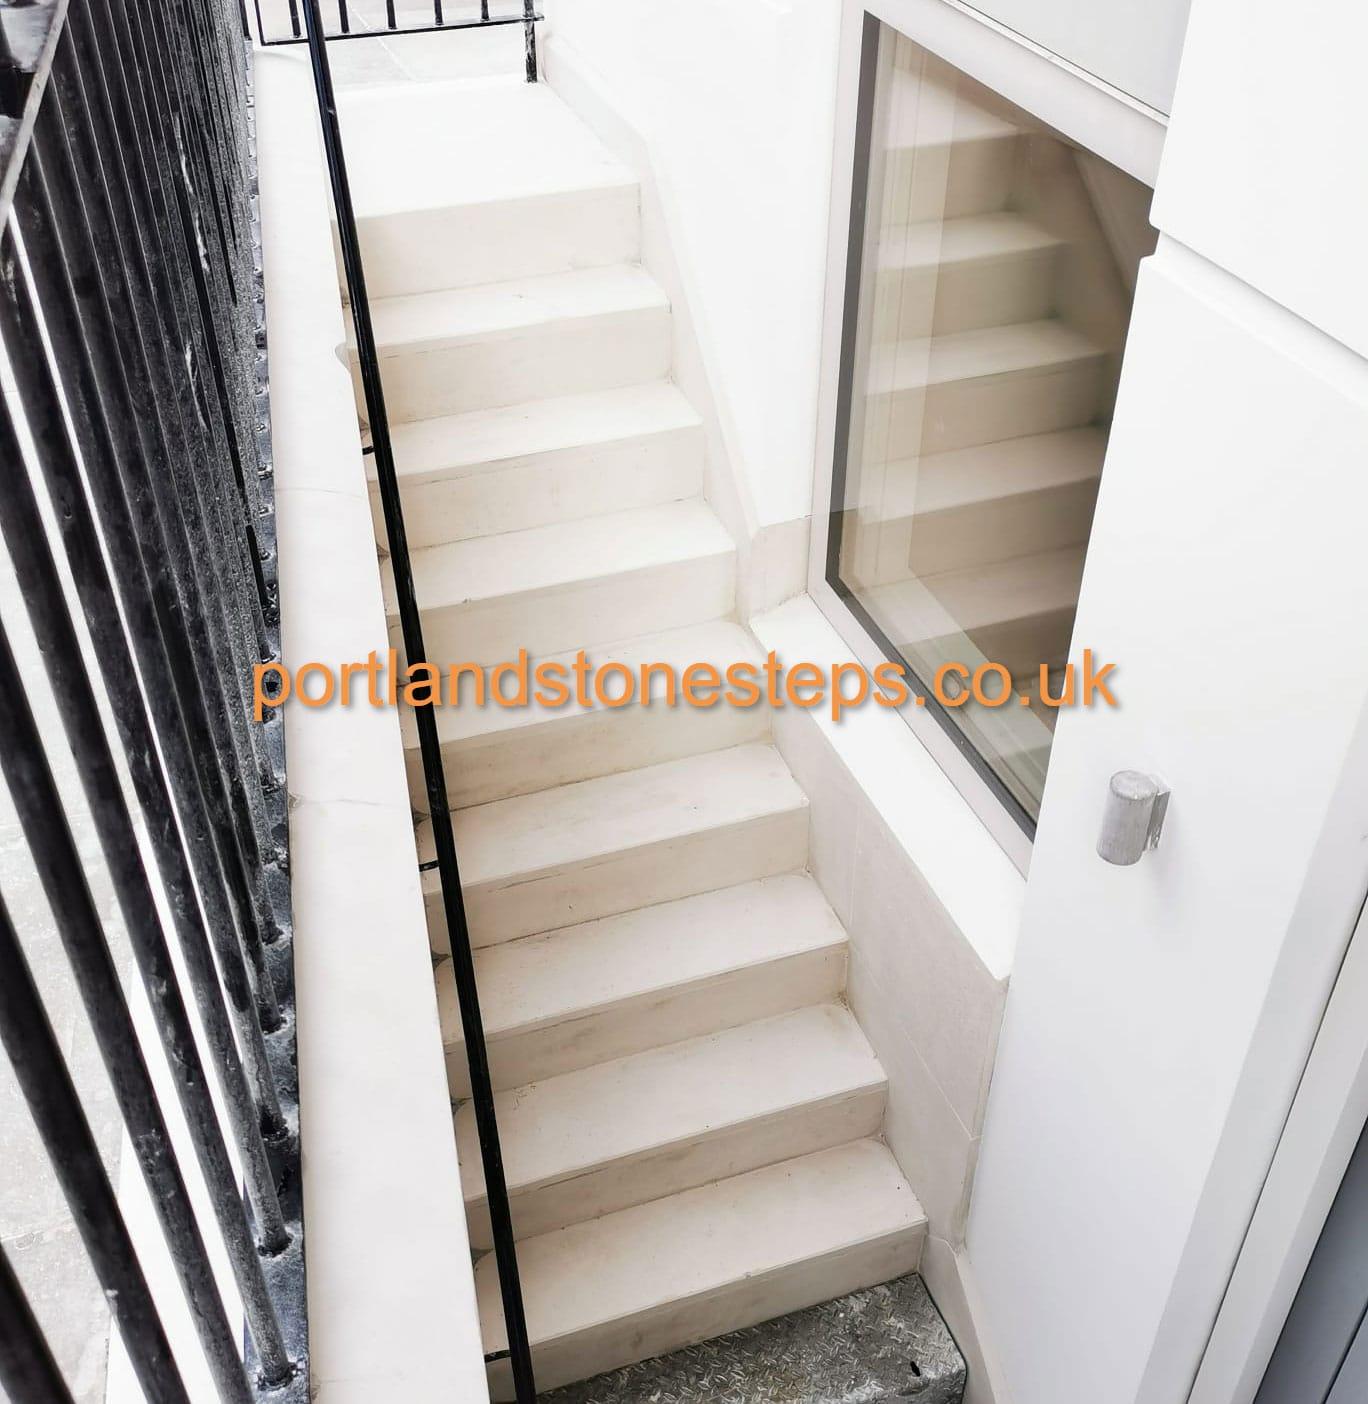 Portland Stone Steps 2021